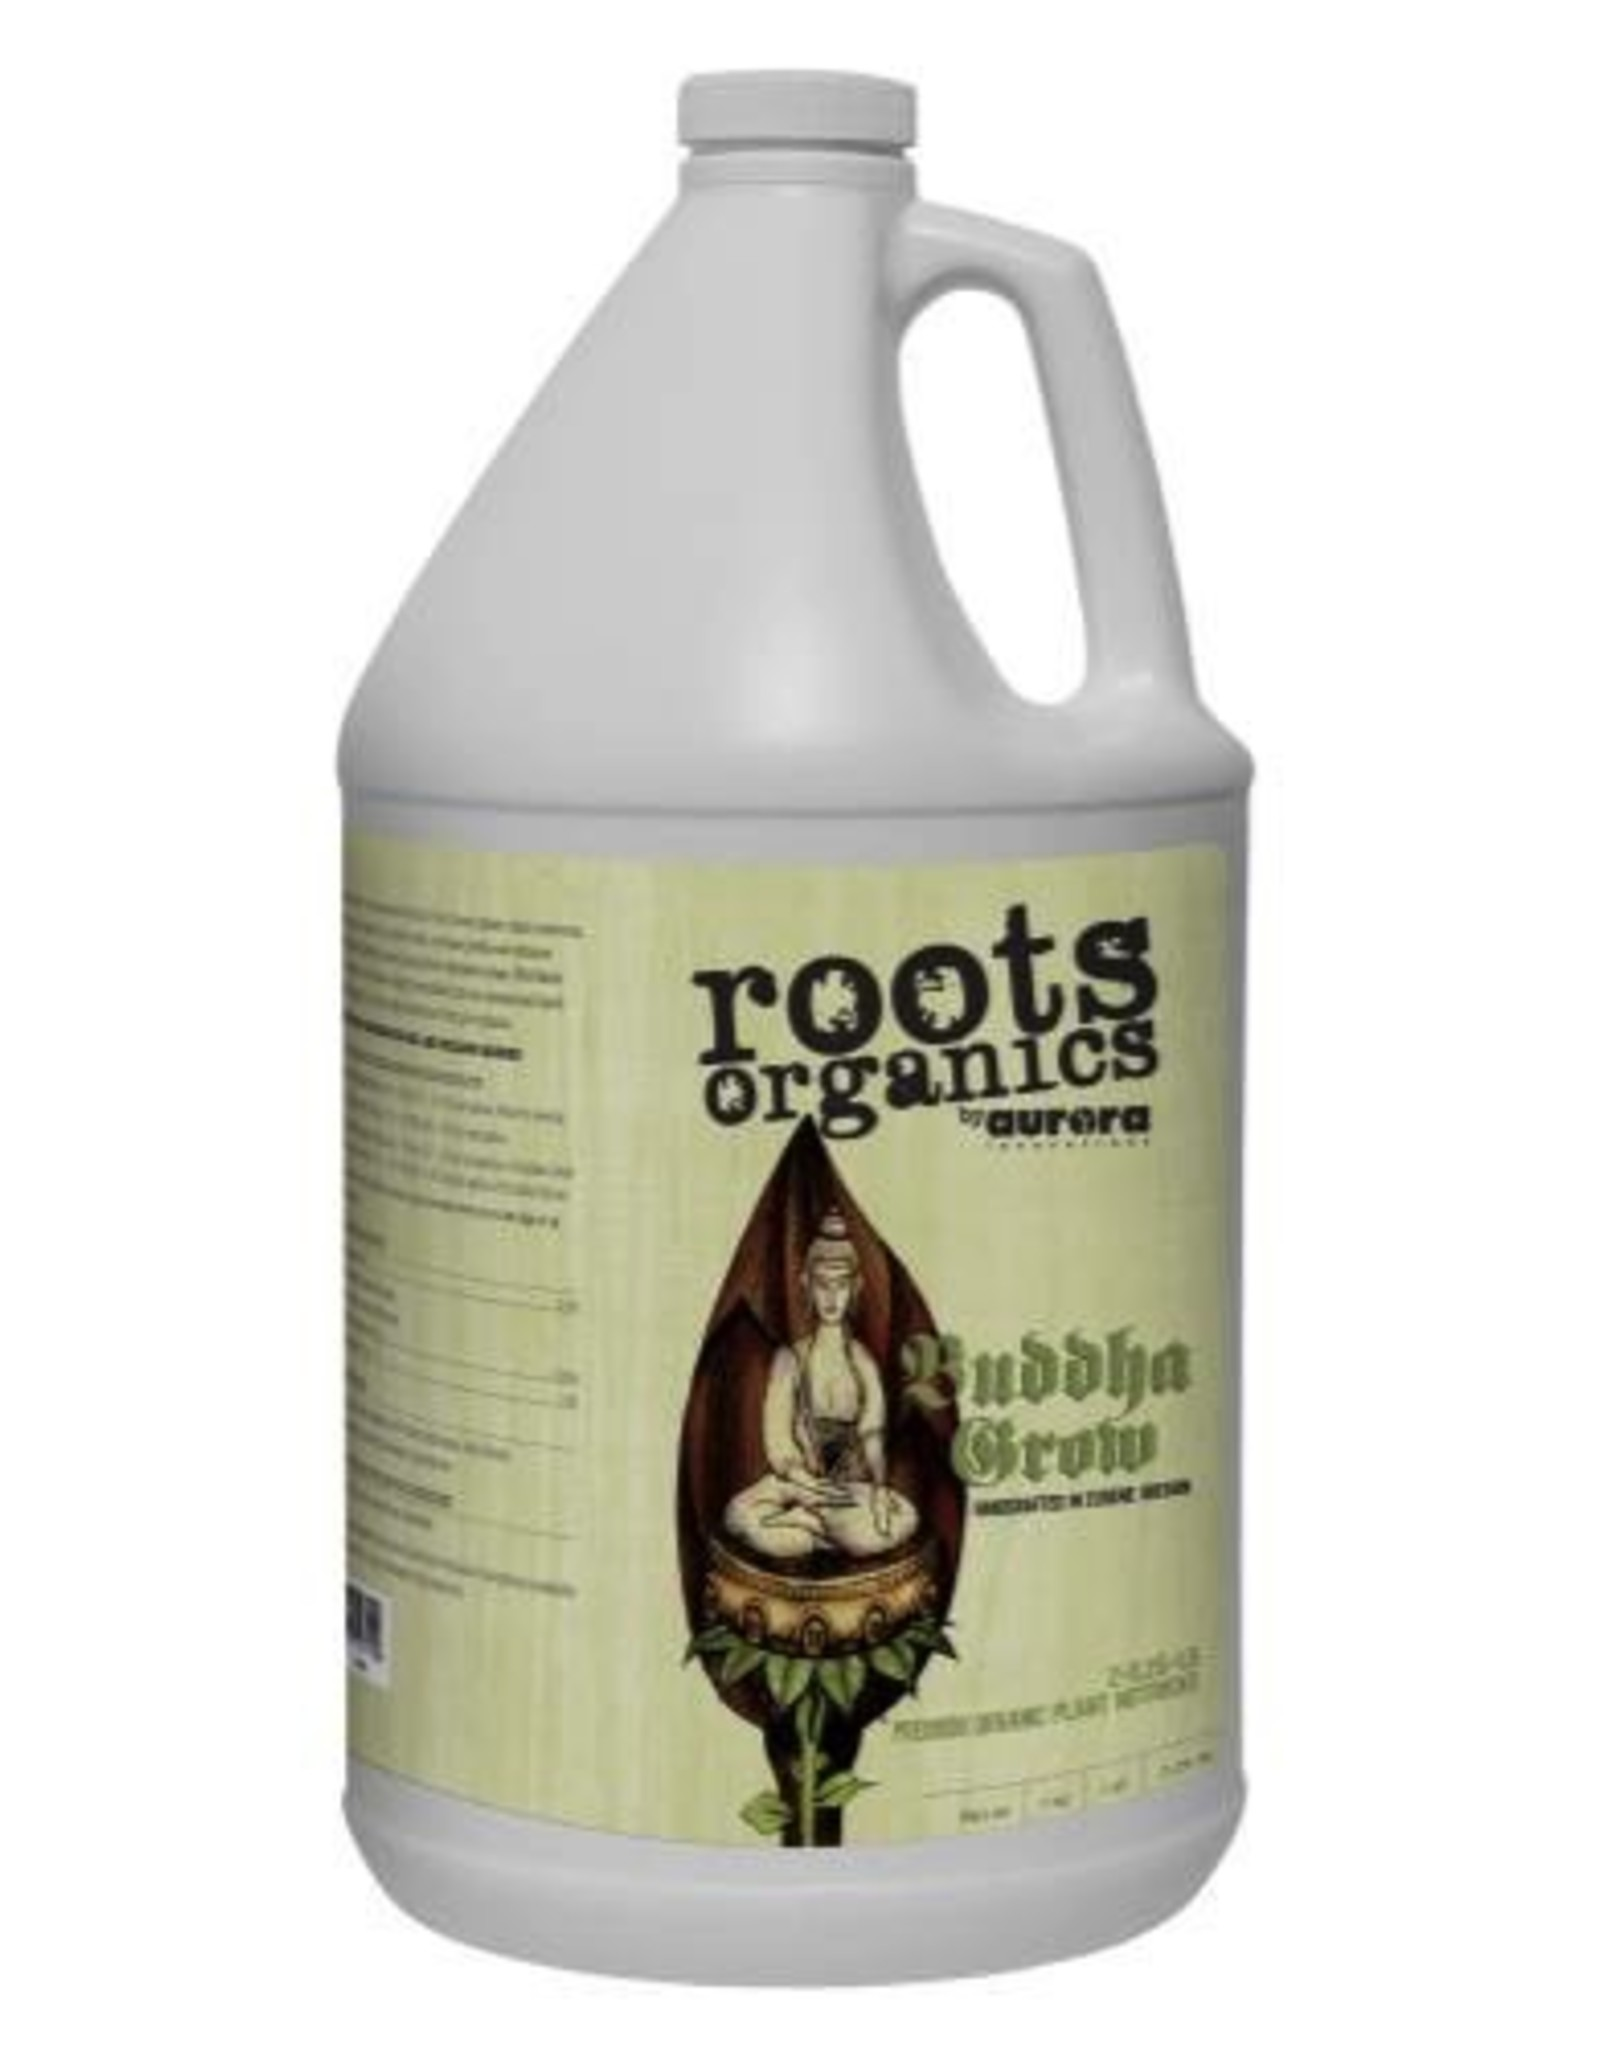 AURORA INNOVATIONS Roots Organics Buddha Grow Gallon